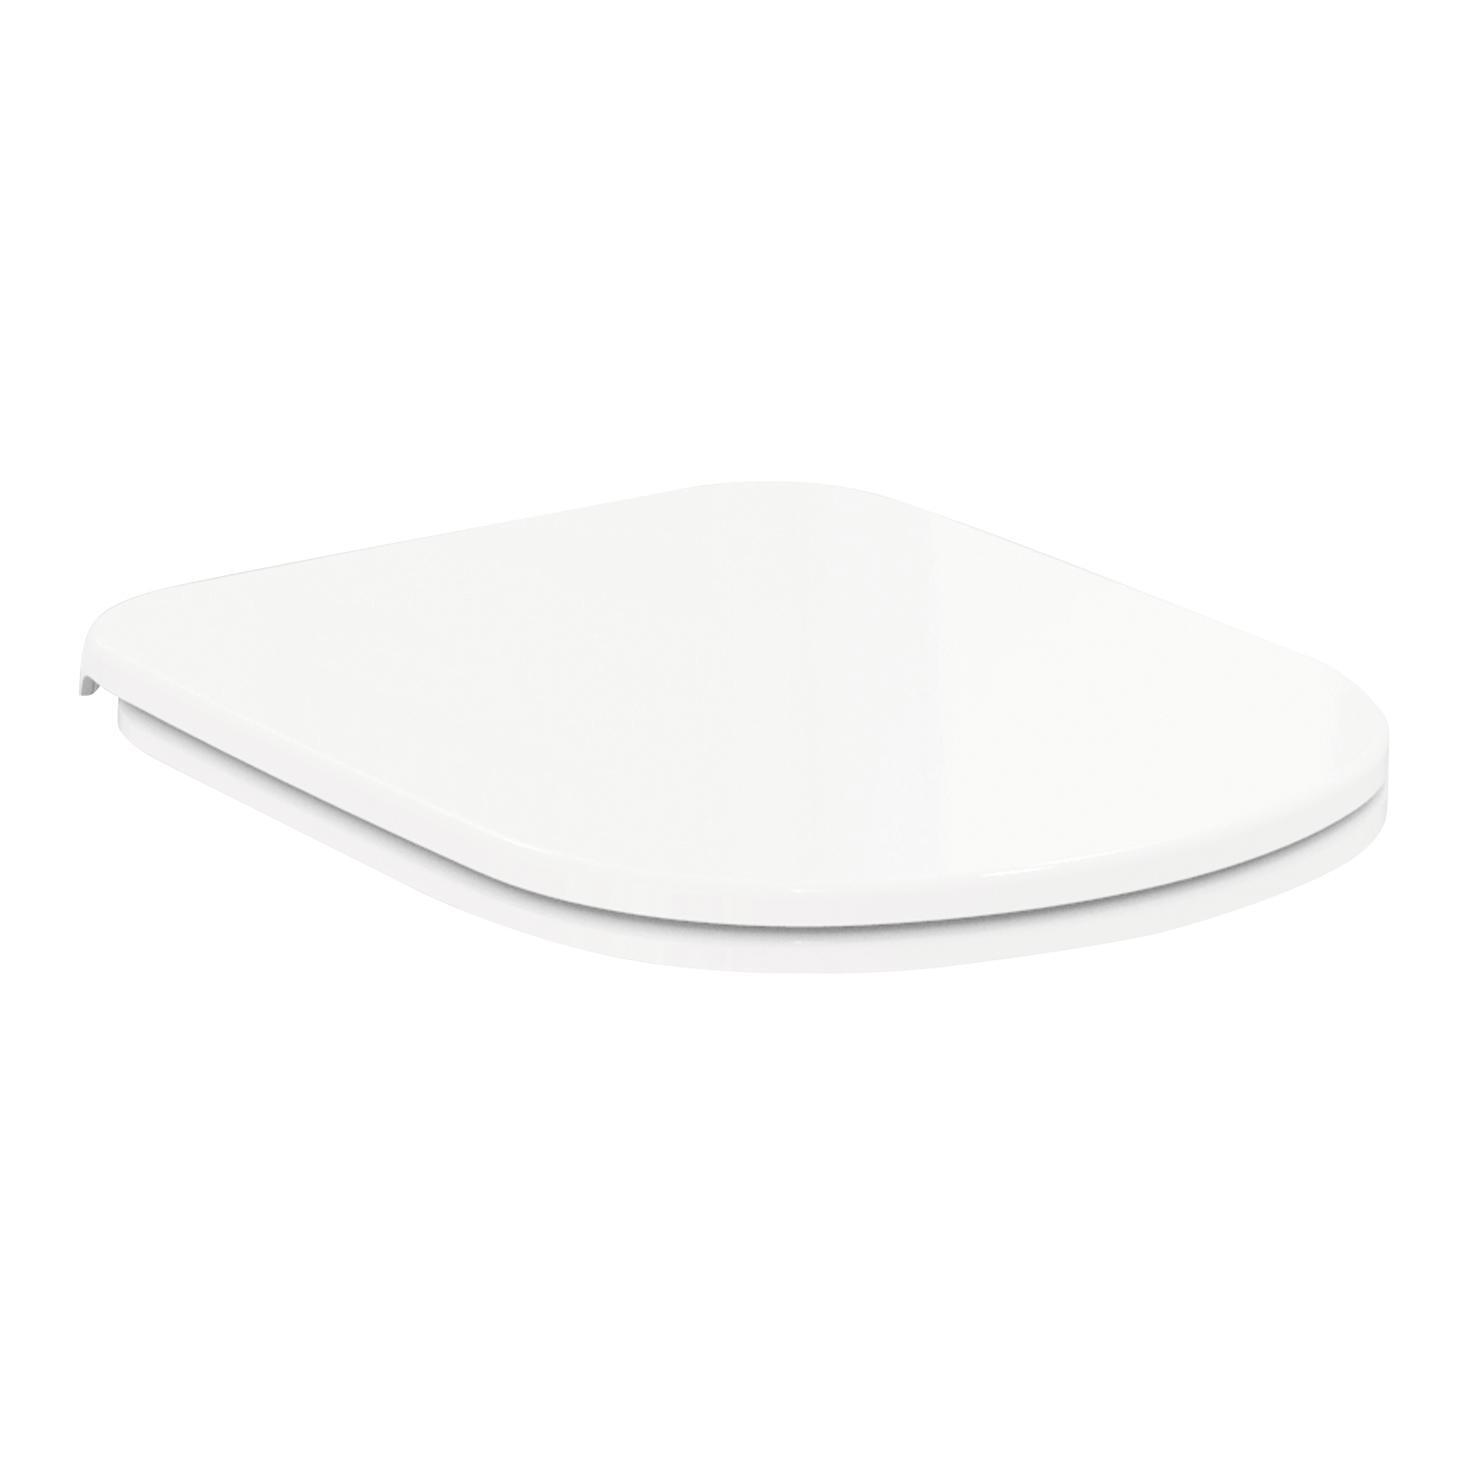 Copriwater ovale Originale per serie sanitari Gemma 2 IDEAL STANDARD termoindurente bianco - 1